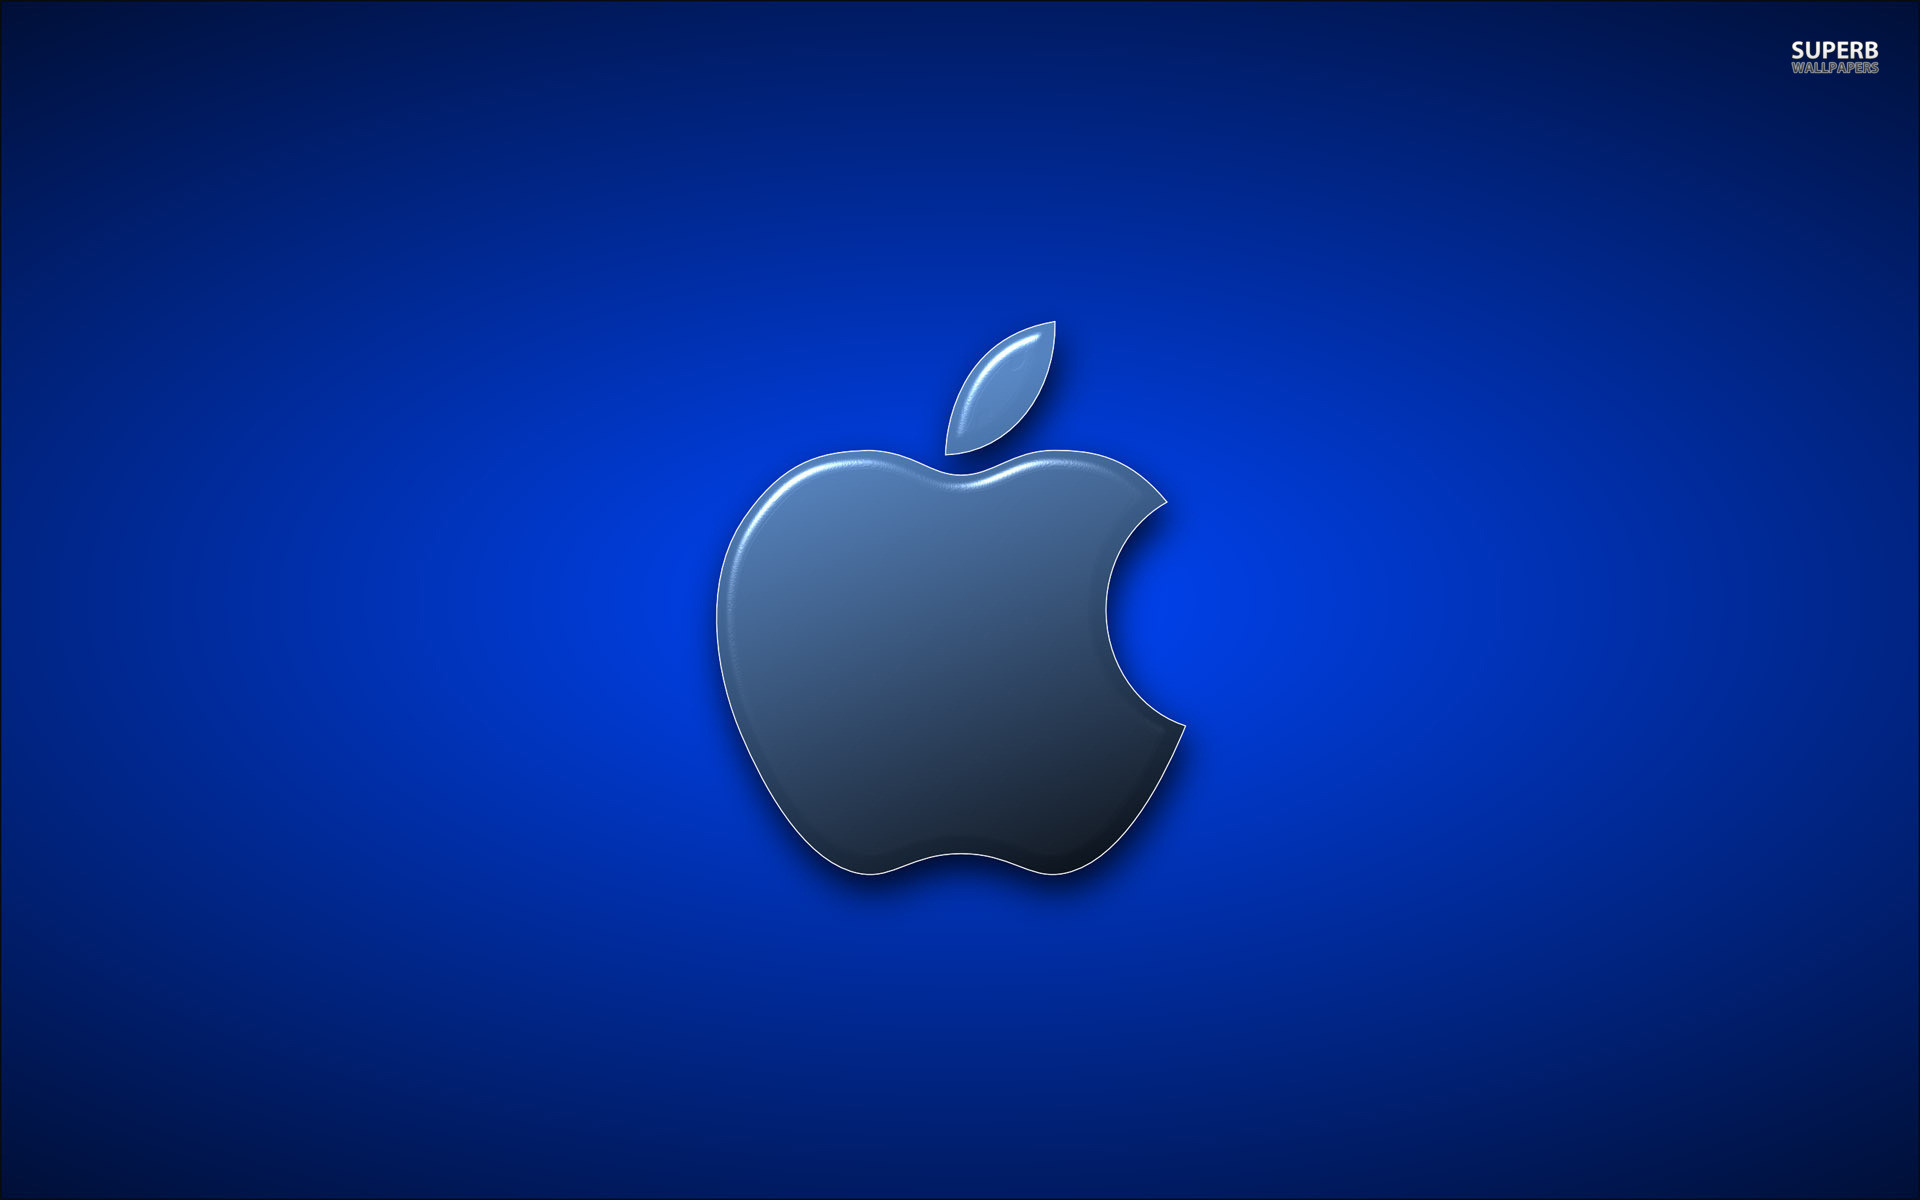 Apple Logo Hd Wallpaper 78 Images